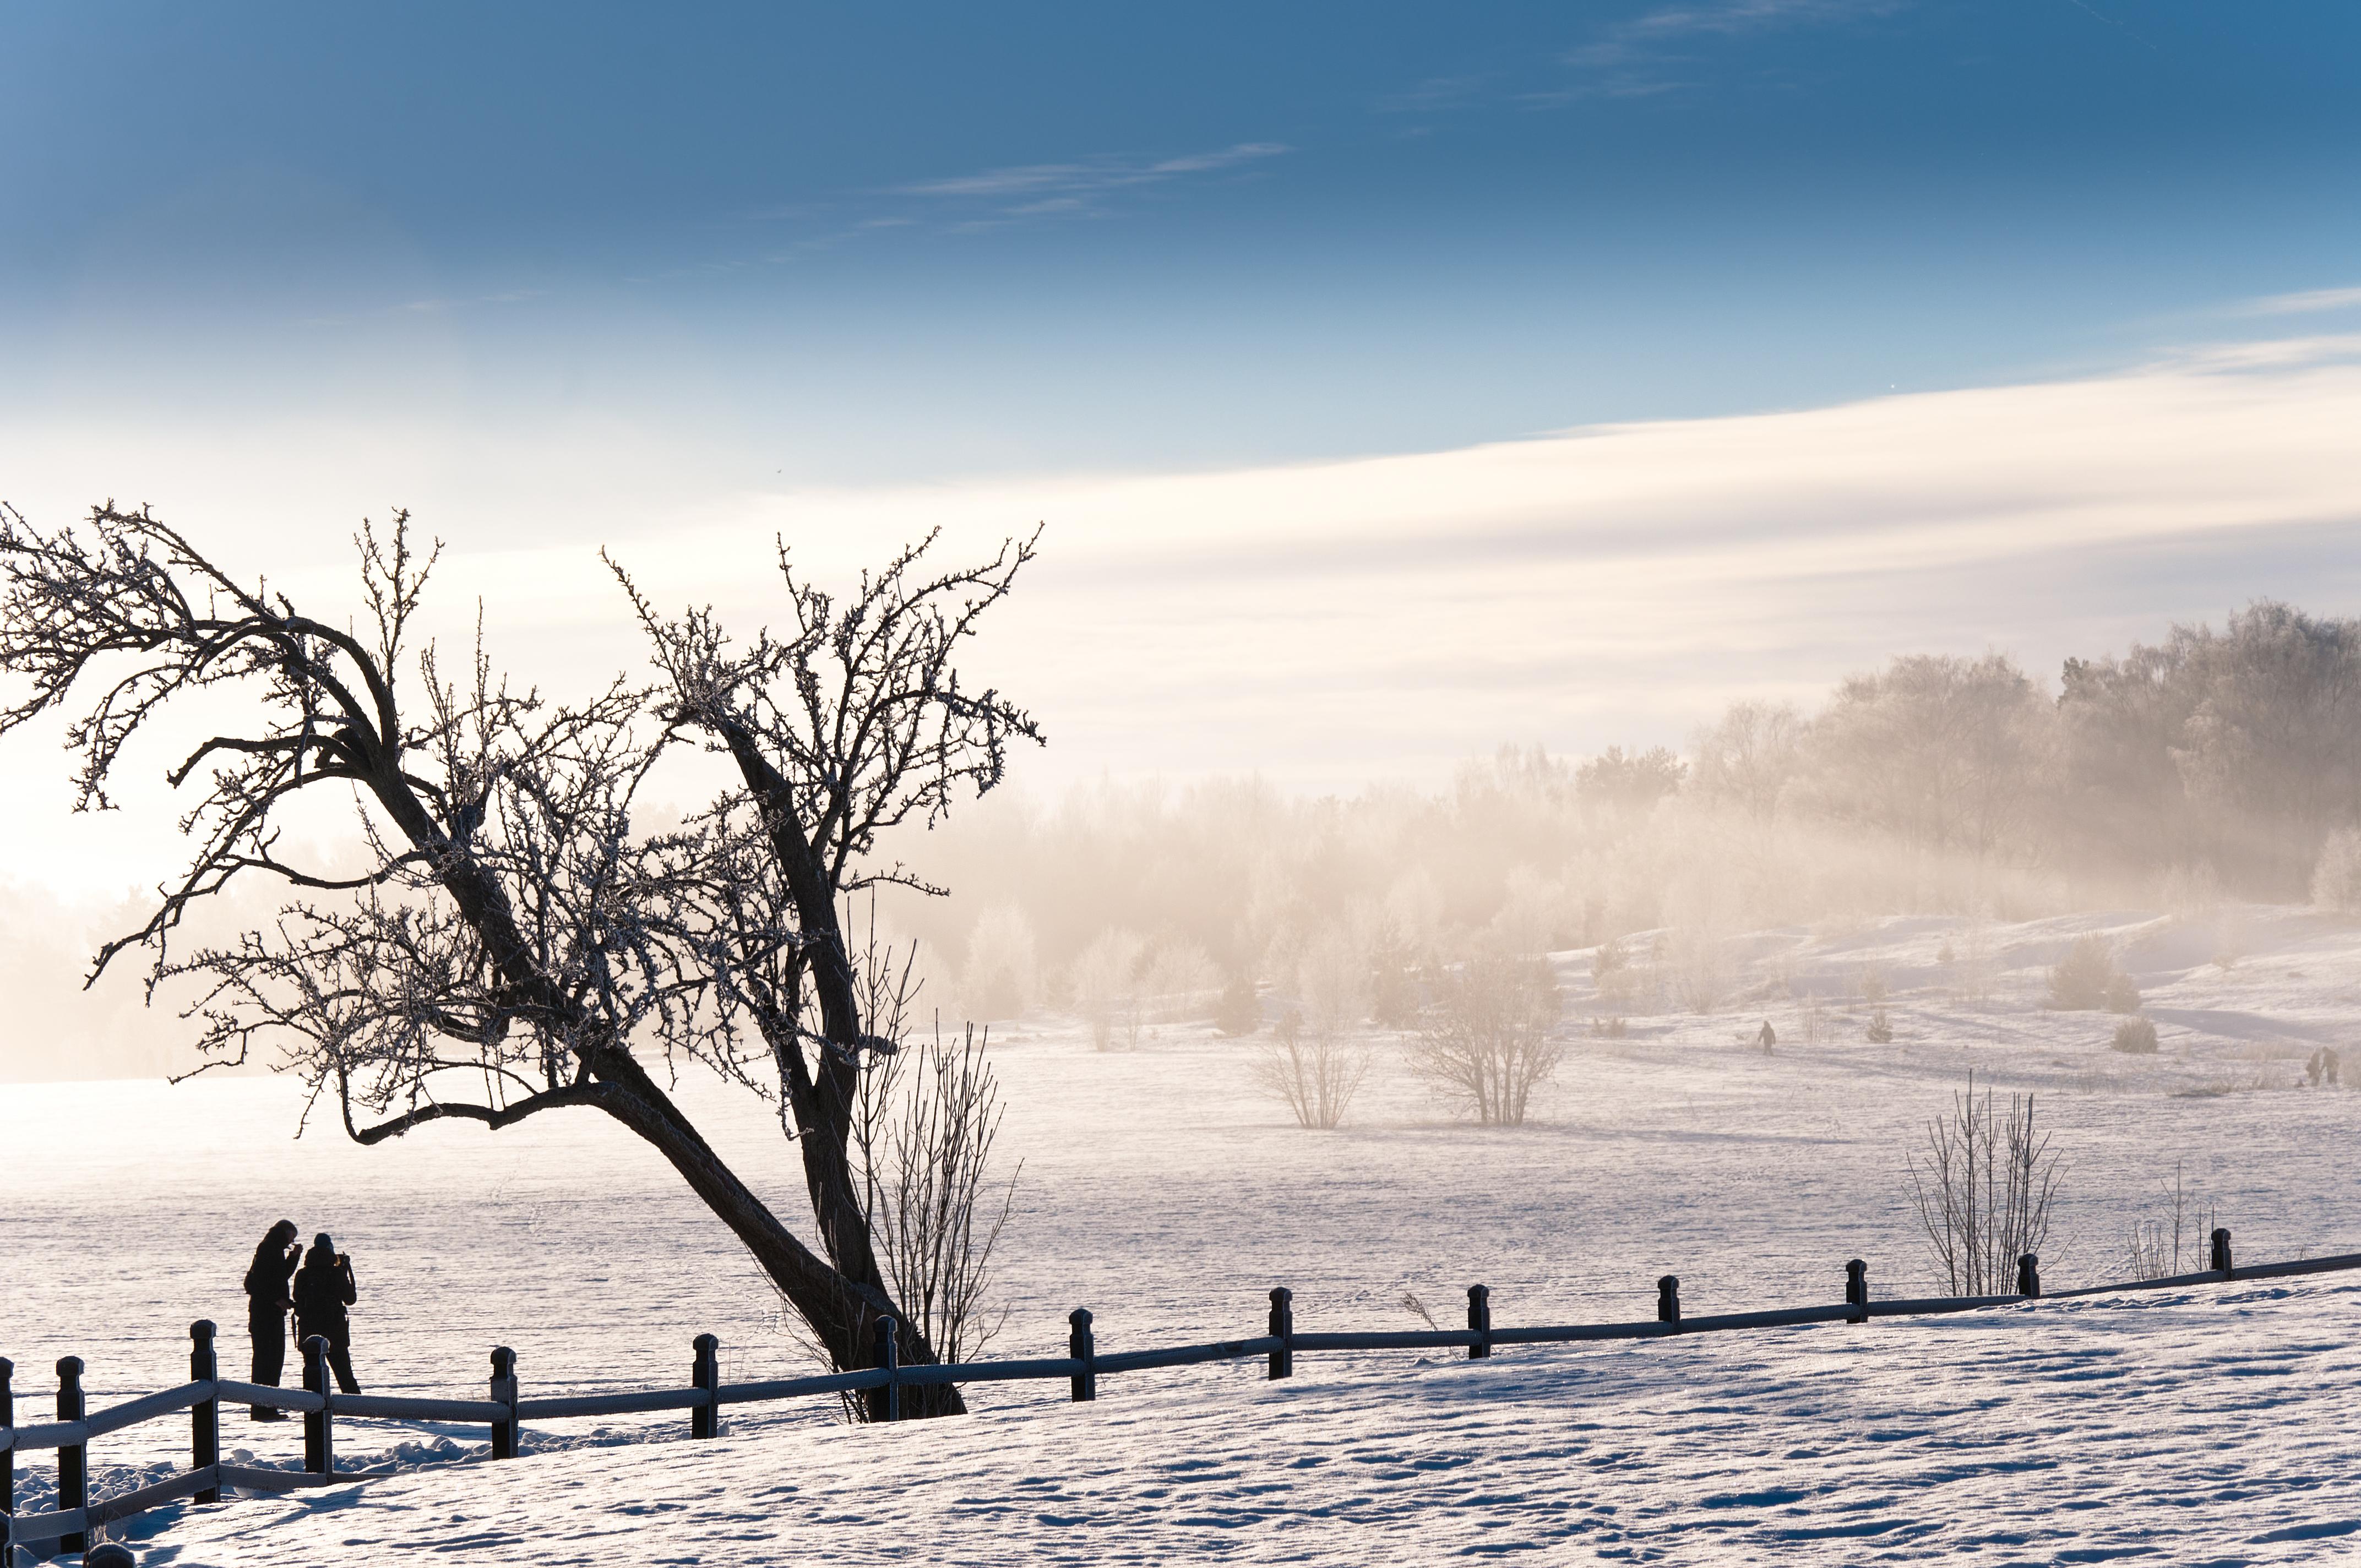 Cold winter morning in old Uppsala, Cold, Landscape, Mist, Morning, HQ Photo